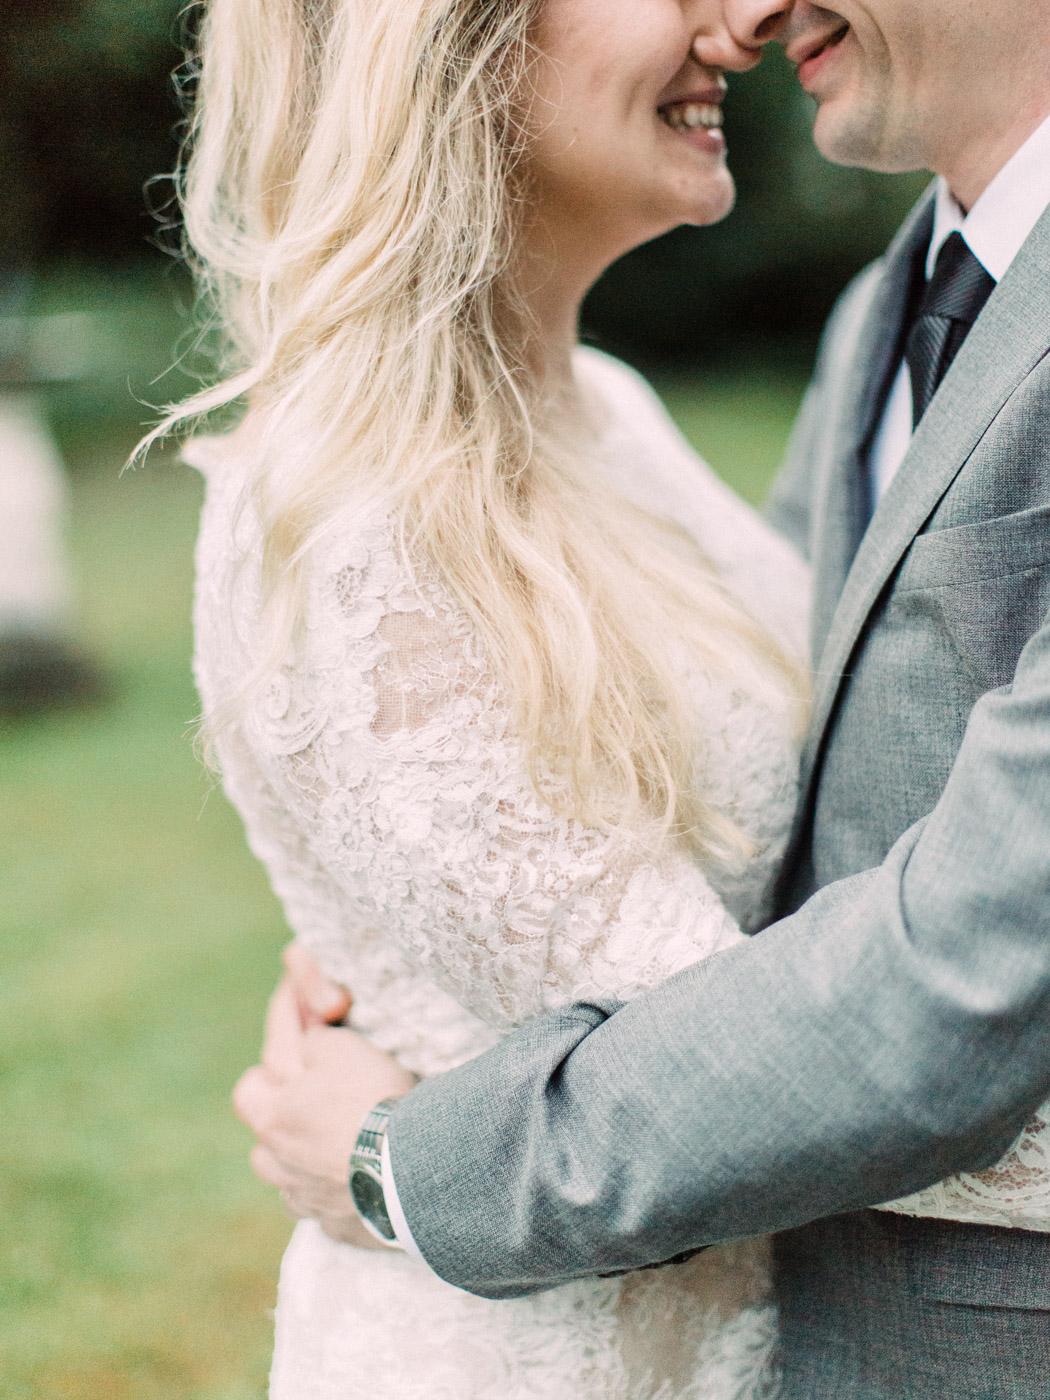 Toronto-wedding-photographer-intimate-classic-fine-art-elopement-ottawa87.jpg